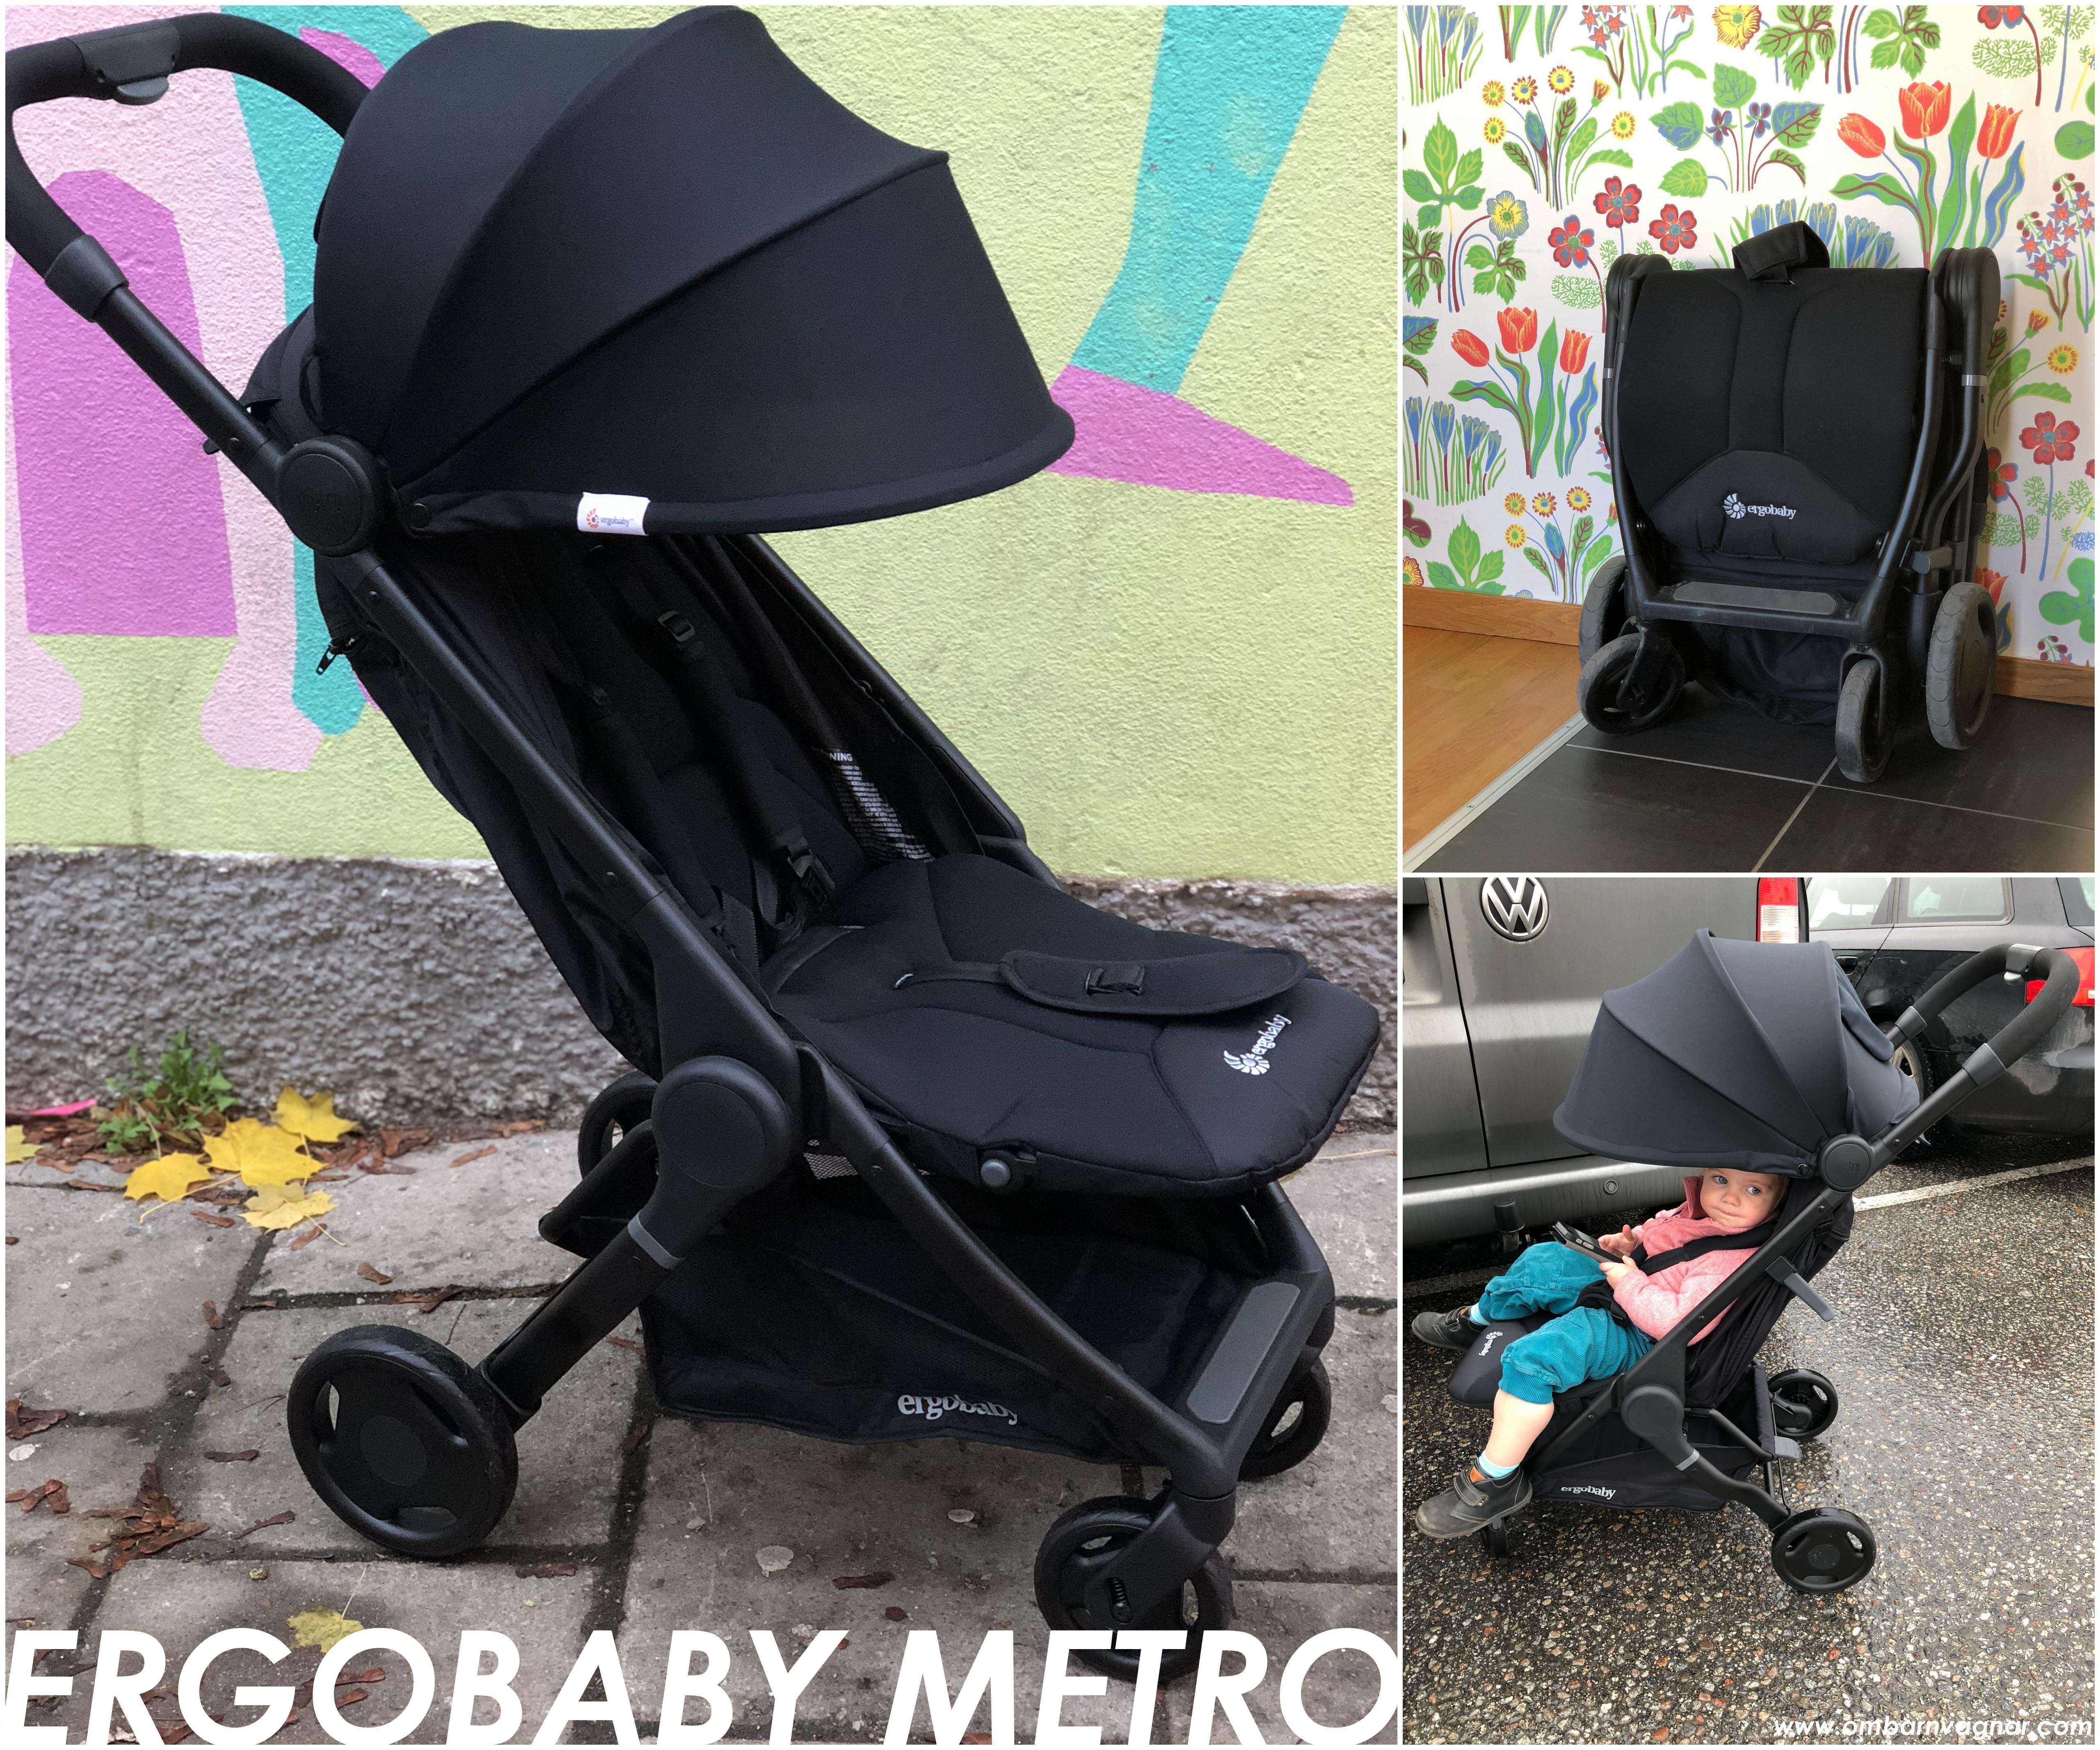 Ergobaby Metro recension